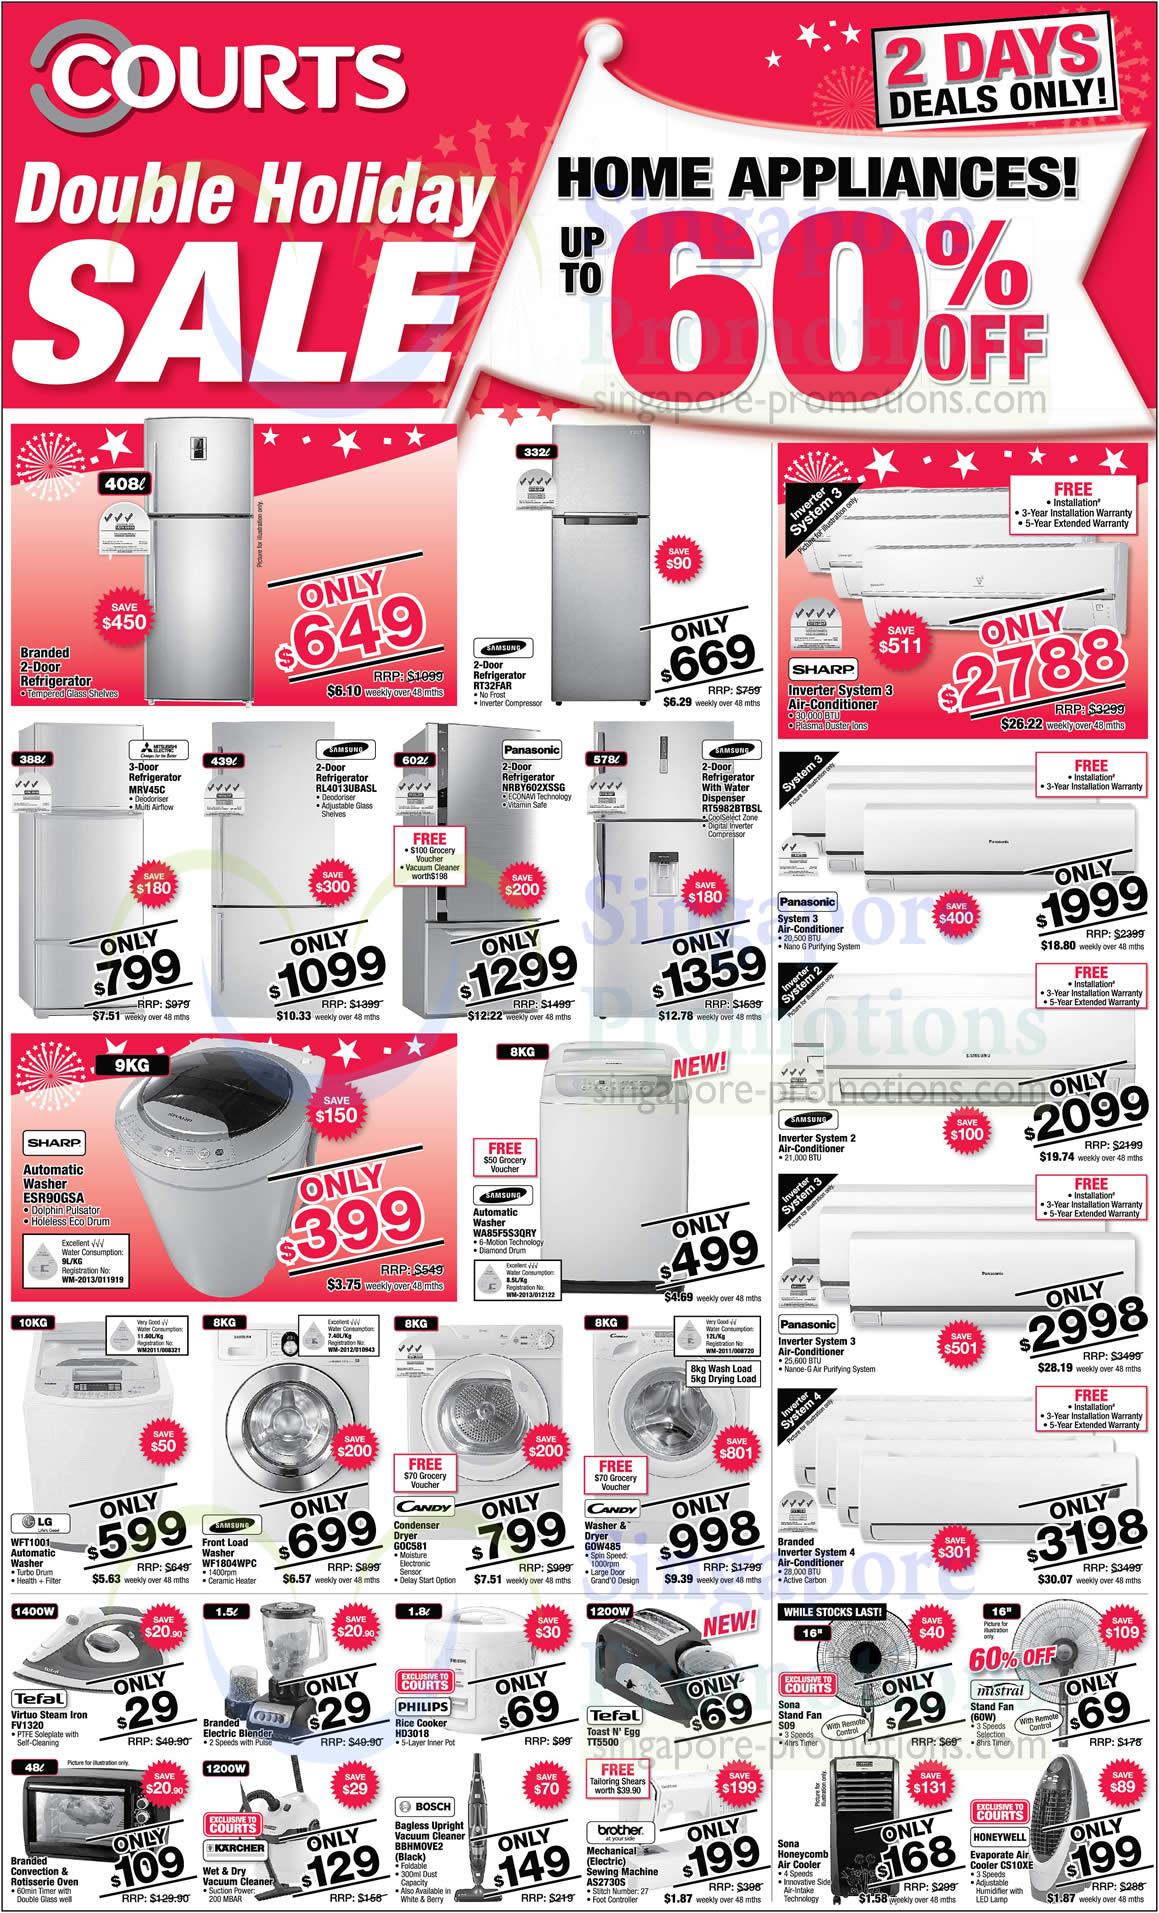 Samsung RT32FAR Fridge, Samsung RL4013UBASL Fridge, Panasonic NRBY602XSSG Fridge, Samsung RT5982BTBSL Fridge, Sharp ESR90GSA Washer, Samsung WA85F5S3QRY Washer, LG WFT1001 Washer, Samsung WF1804WPC Washer, Candy GOW485 Washer, Philips HD3018 Rice Cooker, Tefal TT5500 Toaster, Bosch BBHMOVE2 Vacuum Cleaner, Brother AS2730S Sewing Machine, Sona S09 Fan and Honeywell CS10XE Air Cooler